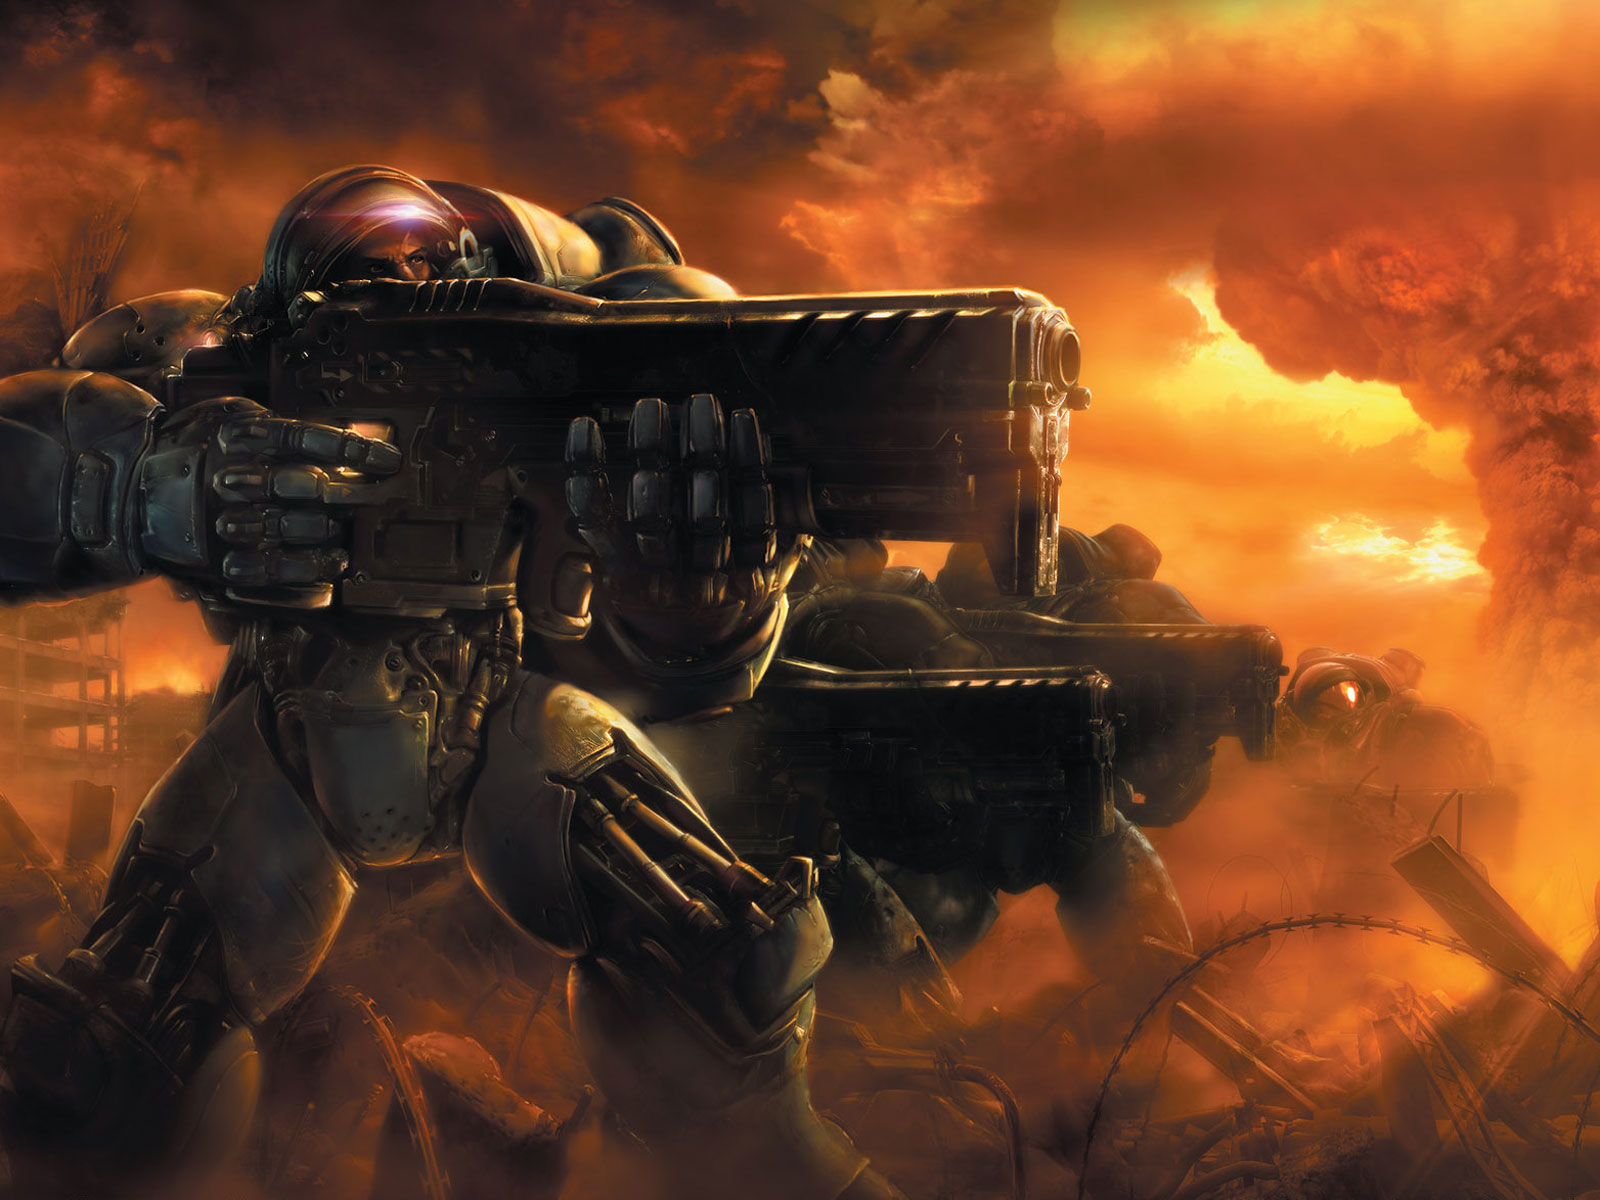 Terran Marines On The Attack - Starcraft 2 Wallpaper